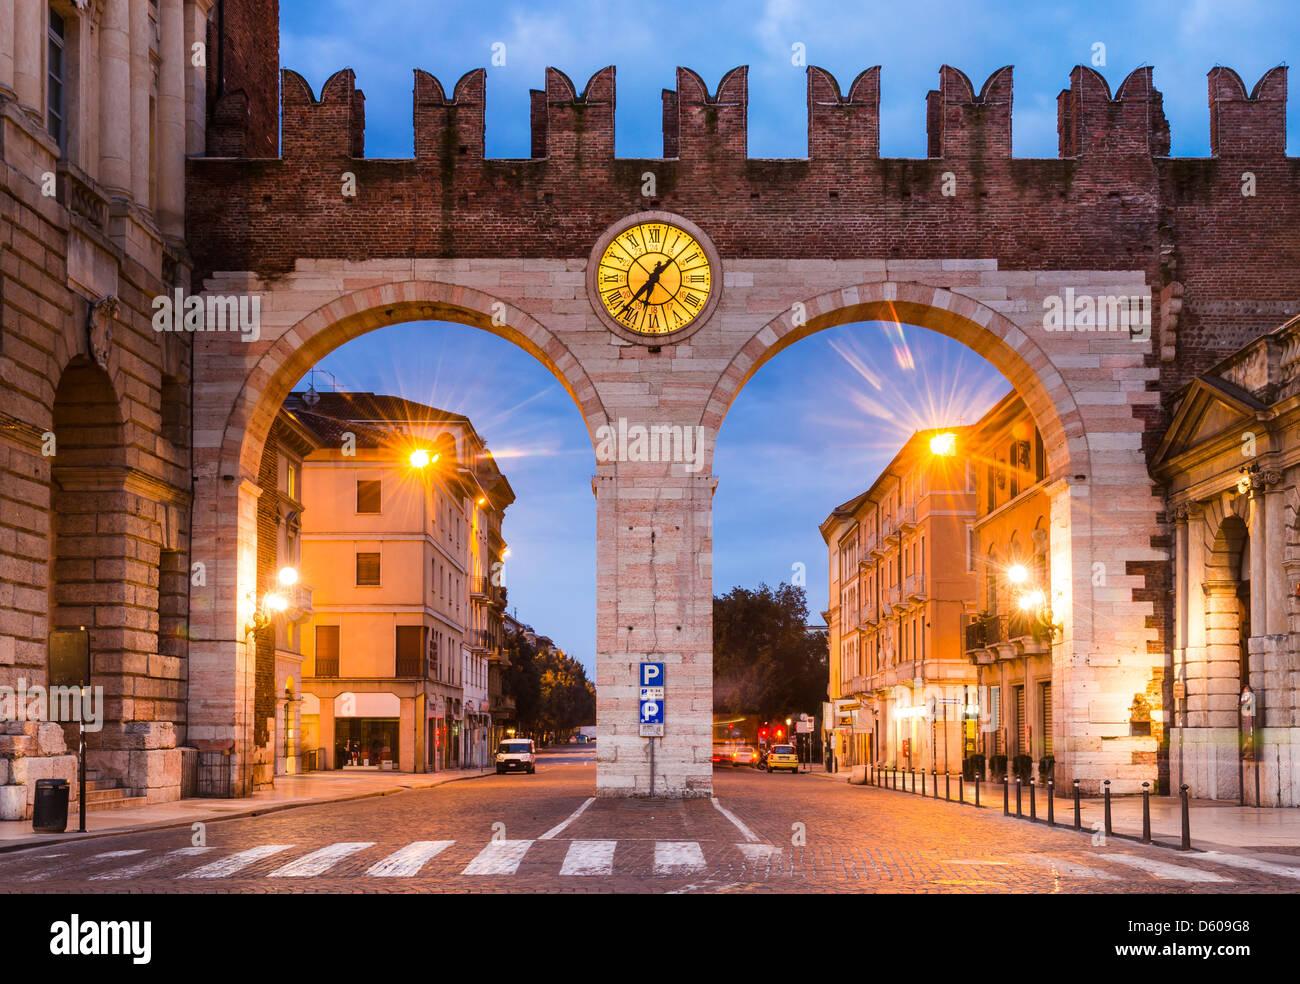 Portoni della Bra, one of medieval entrance of historical city Verona, northern Italy - Stock Image